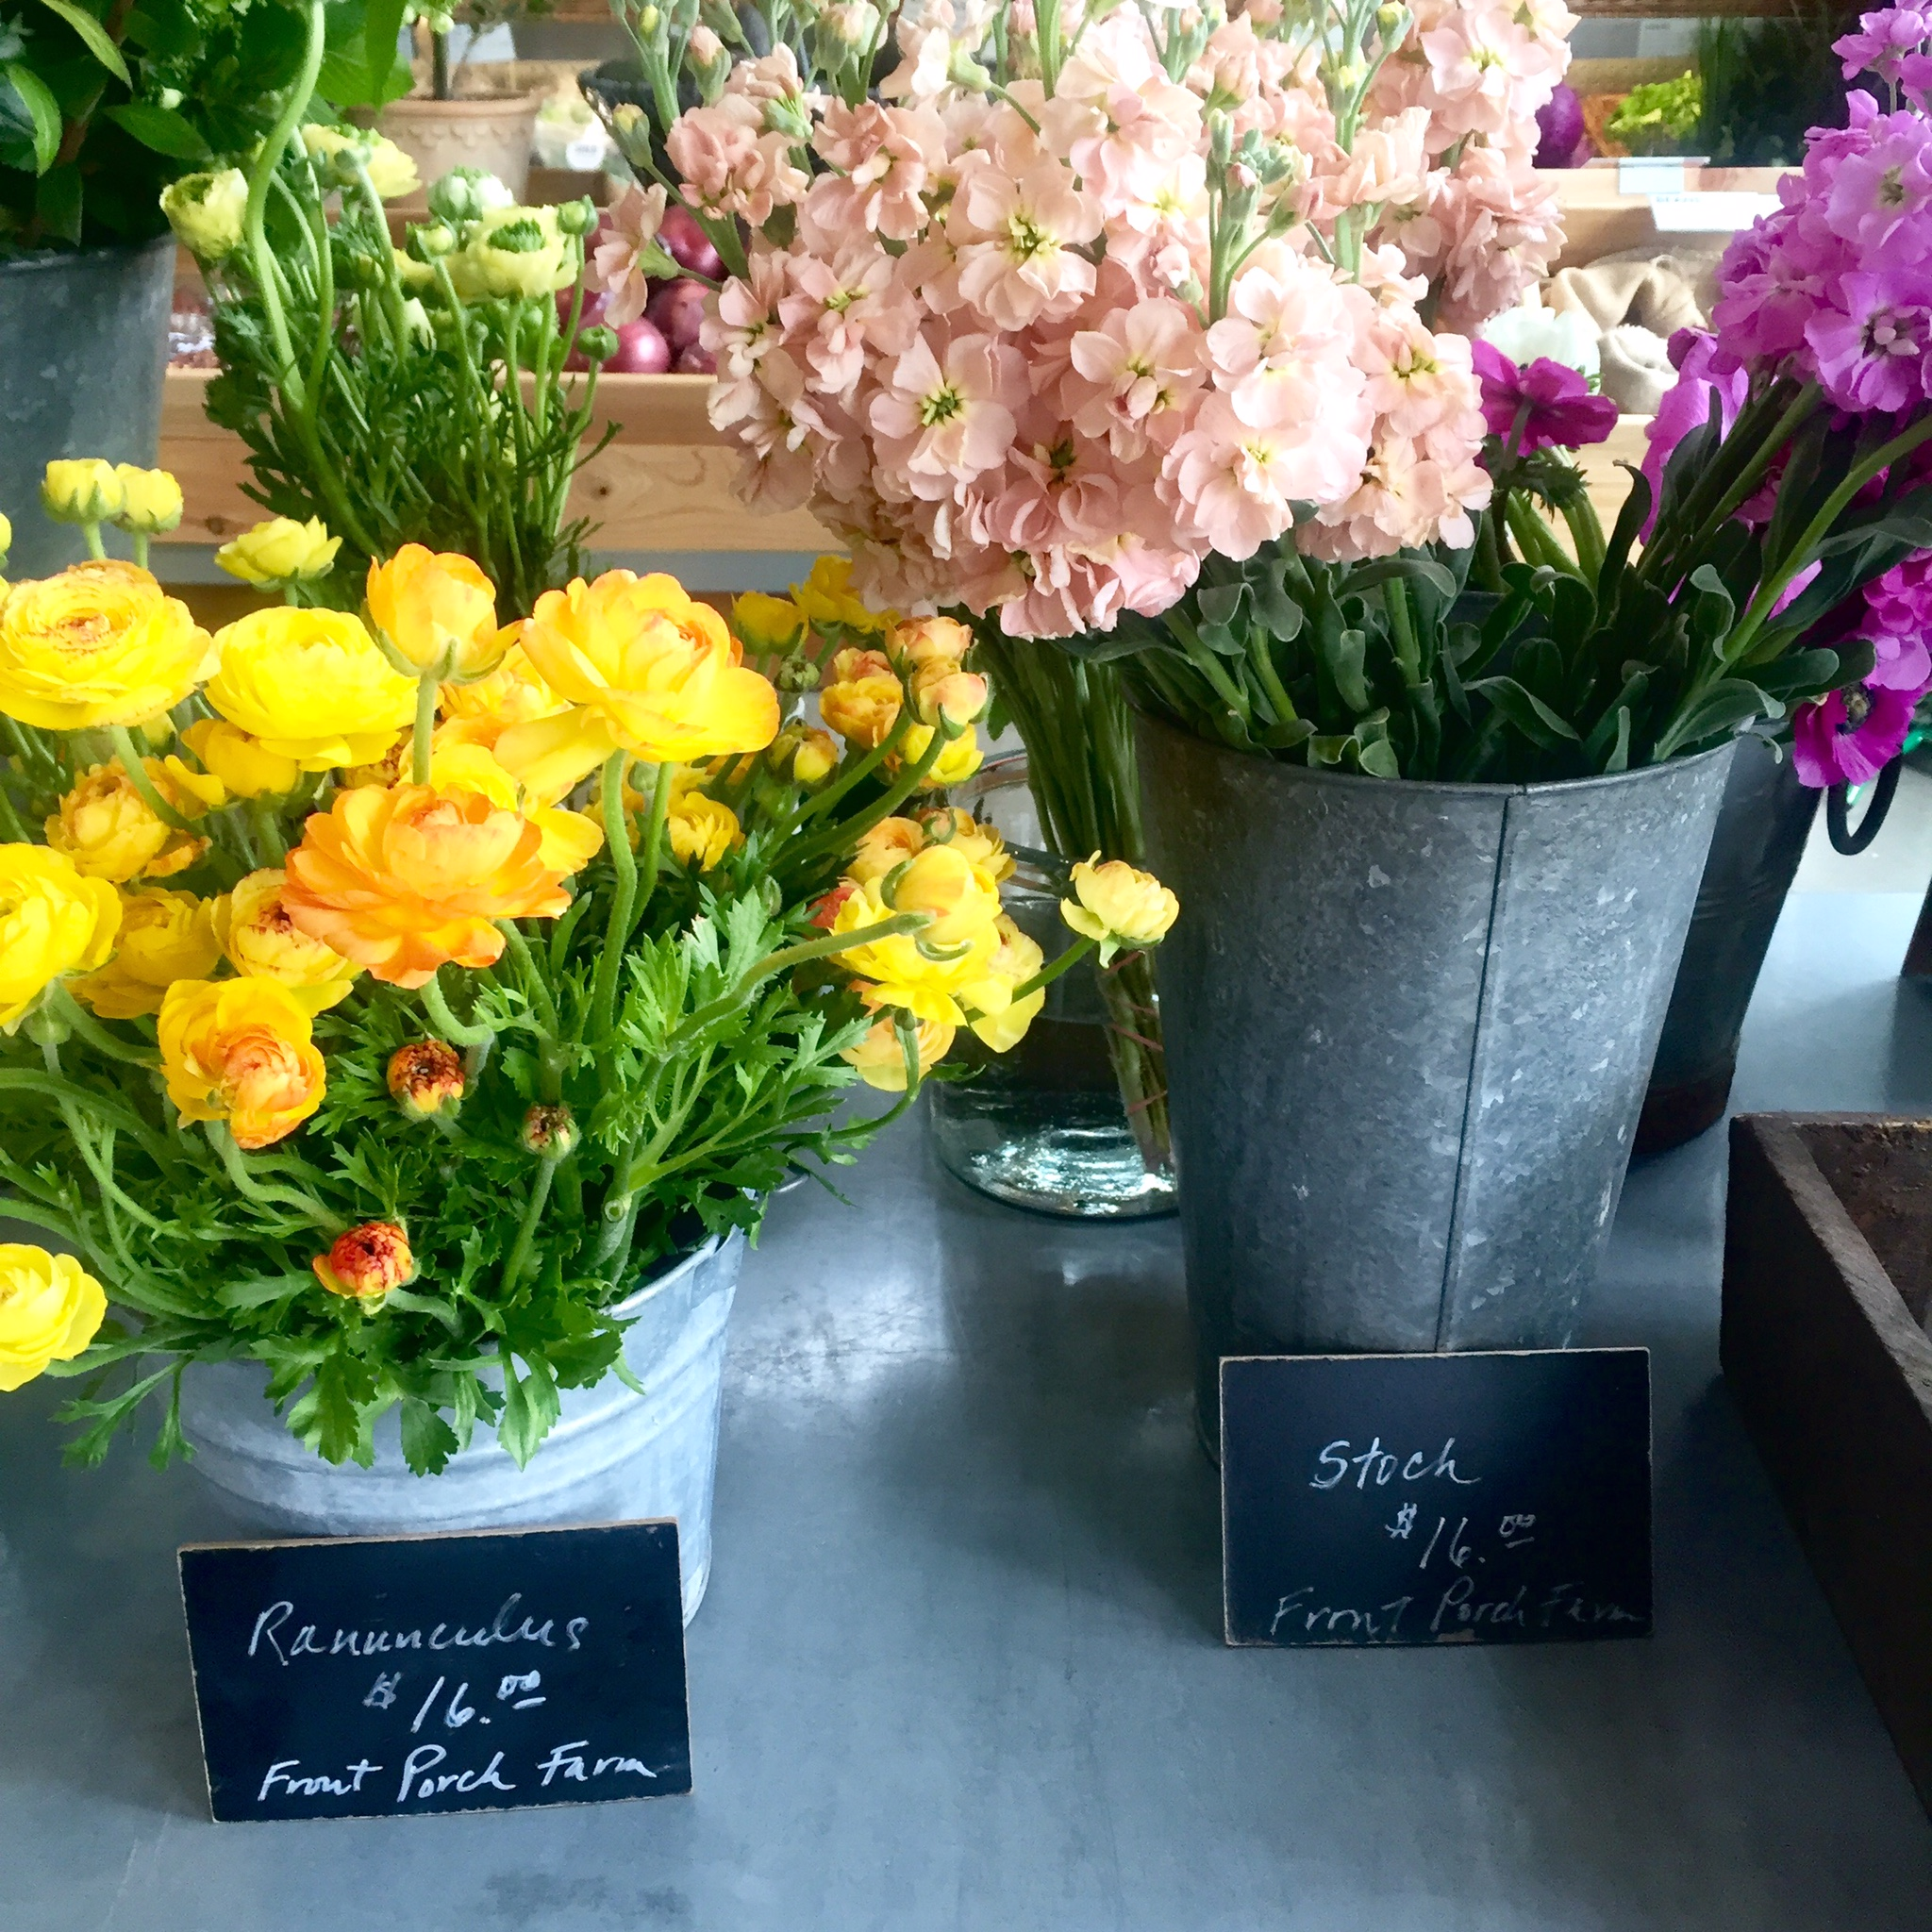 Flowers-San-Francisco-Flower-Market